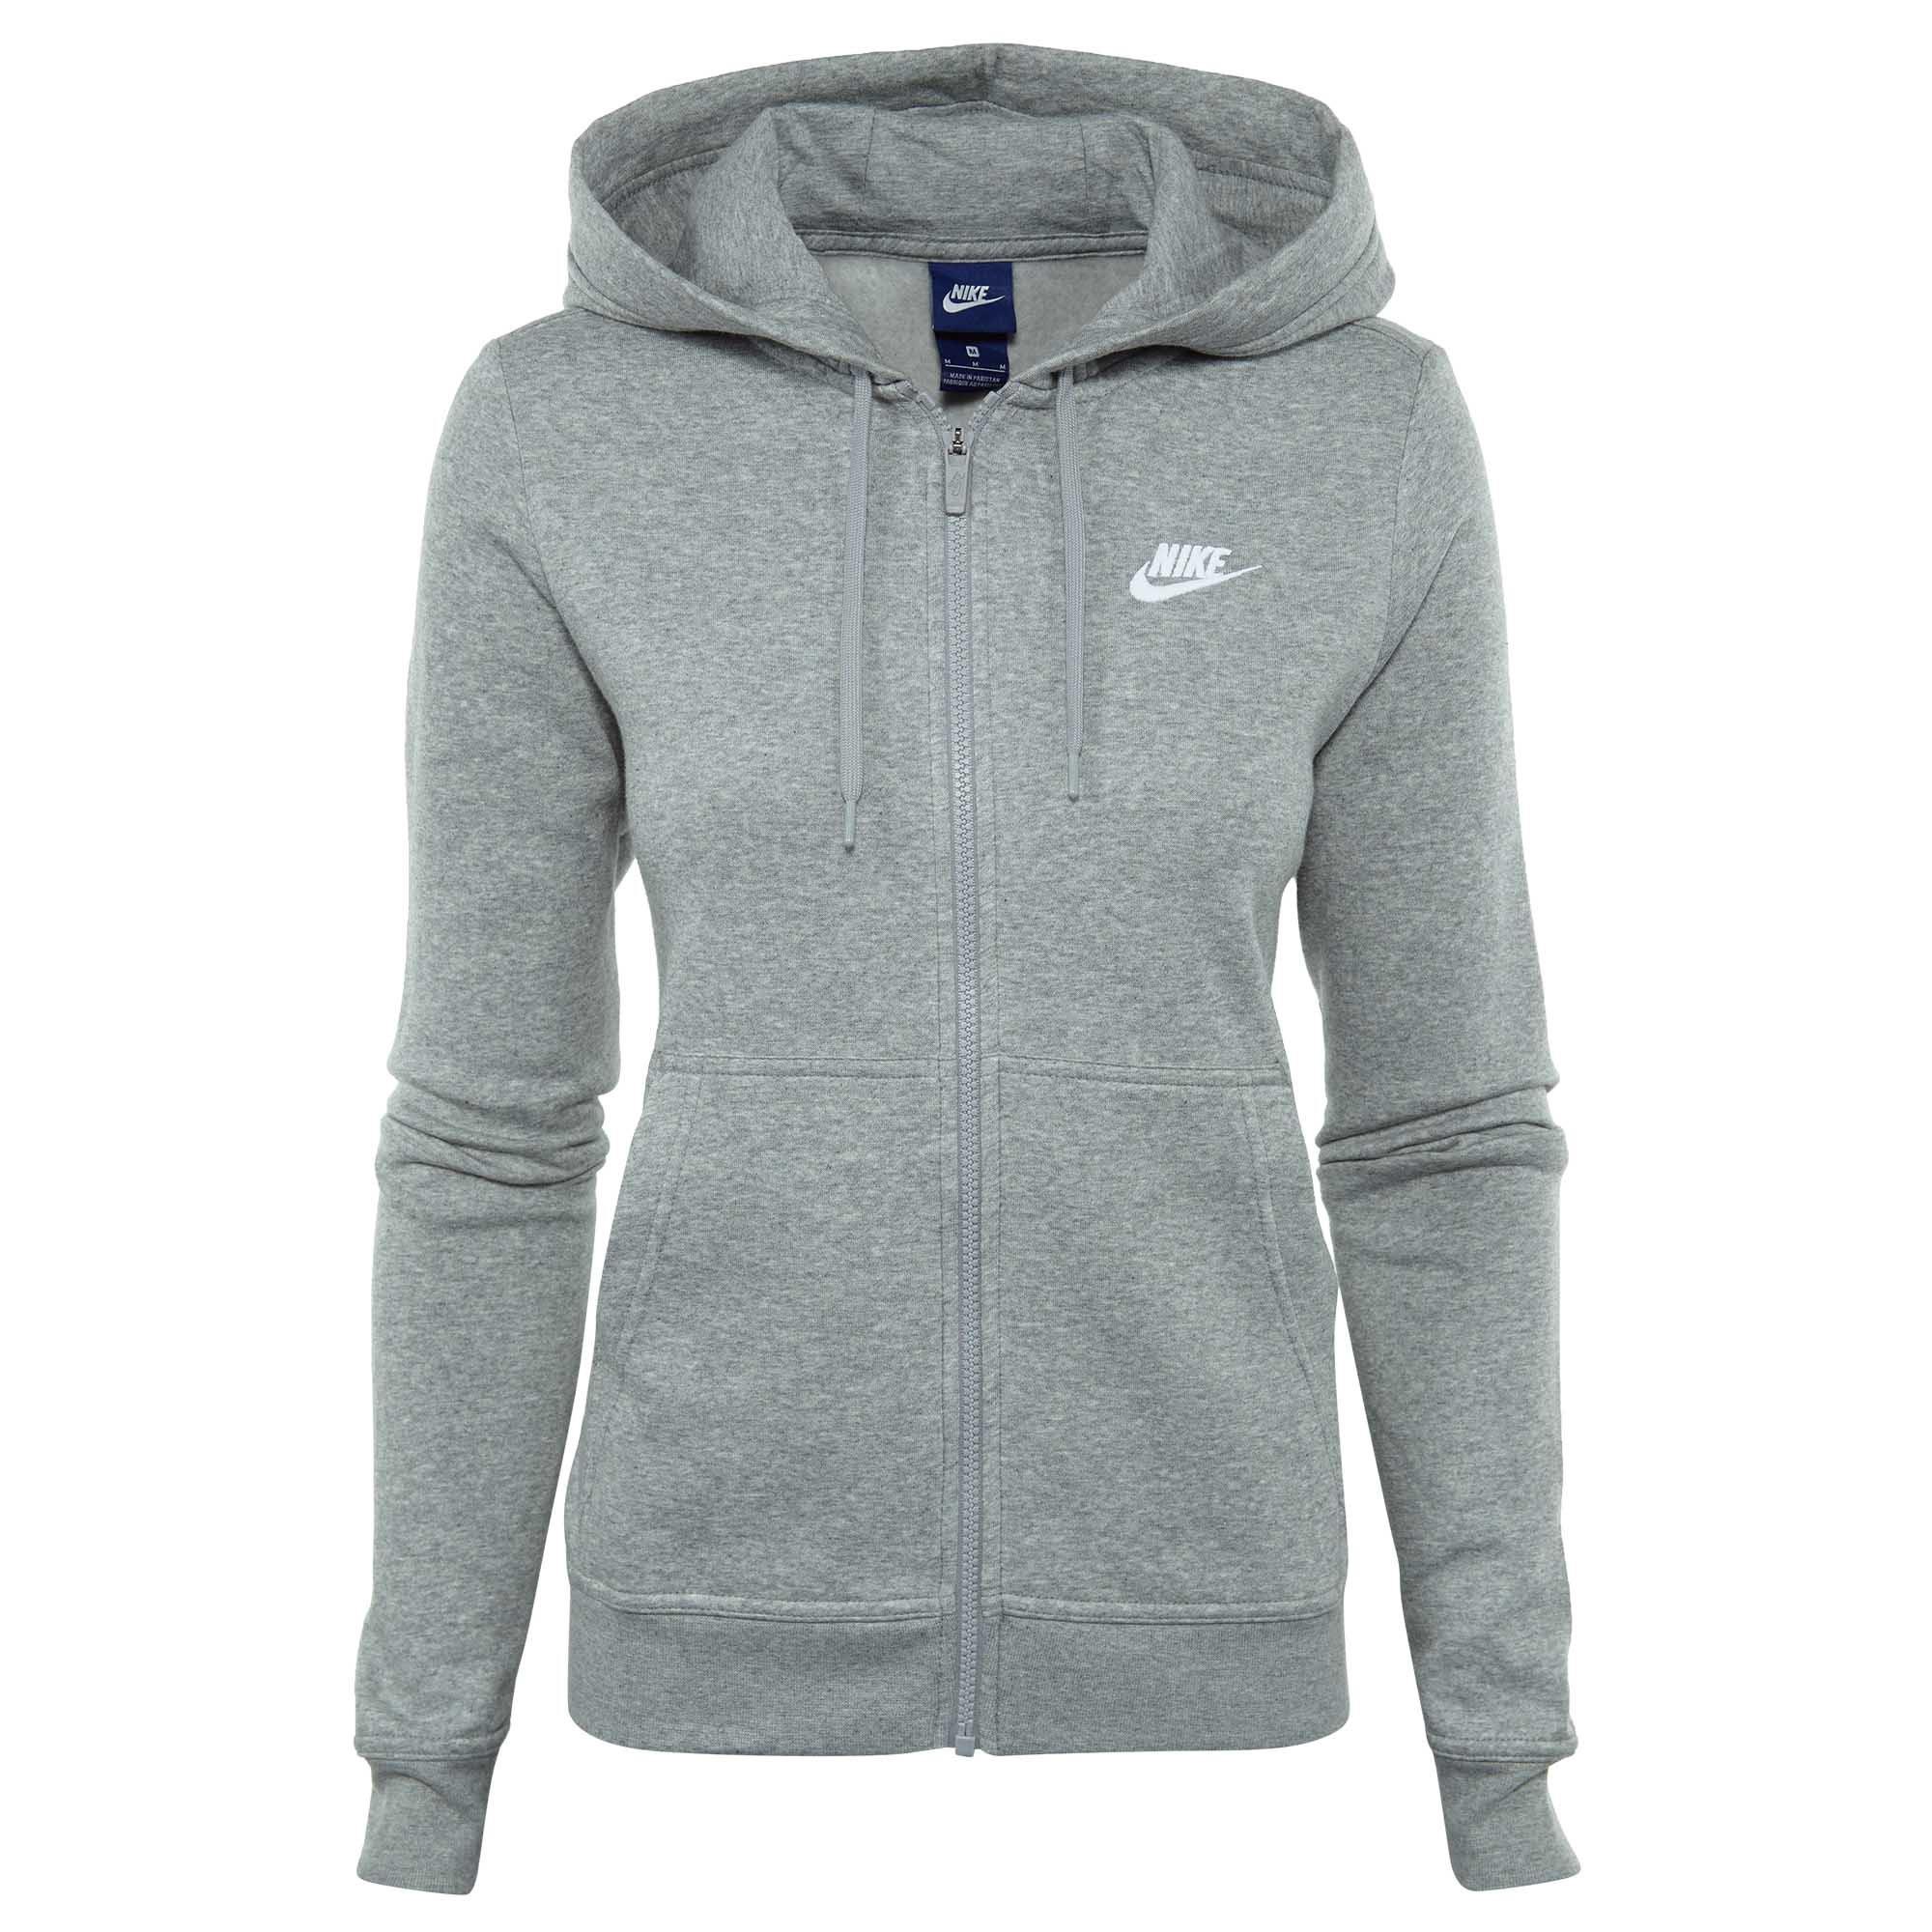 NIKE Sportswear Women's Full Zip Fleece Hoodie, Dark Grey Heather/Dark Grey Heather/White, XX-Large